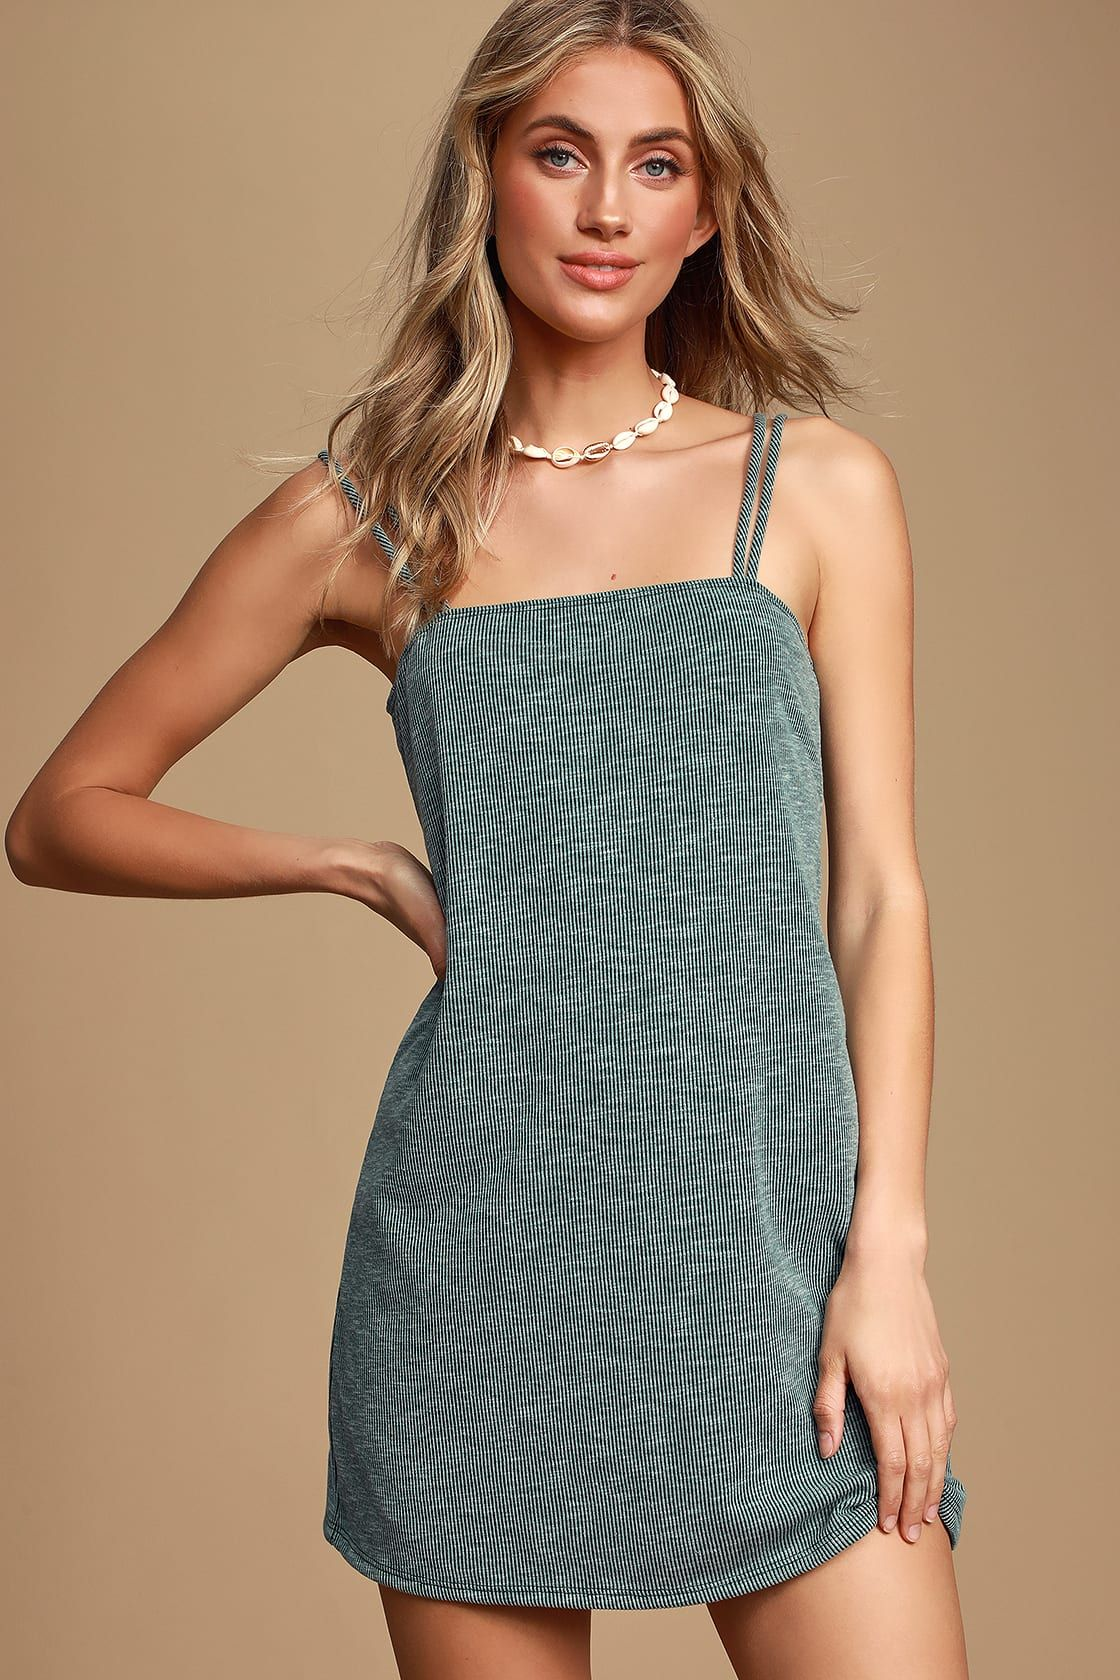 Lulus | Aberdeen Sage Green Ribbed Strappy Sheath Dress | Size Large #sagegreendress